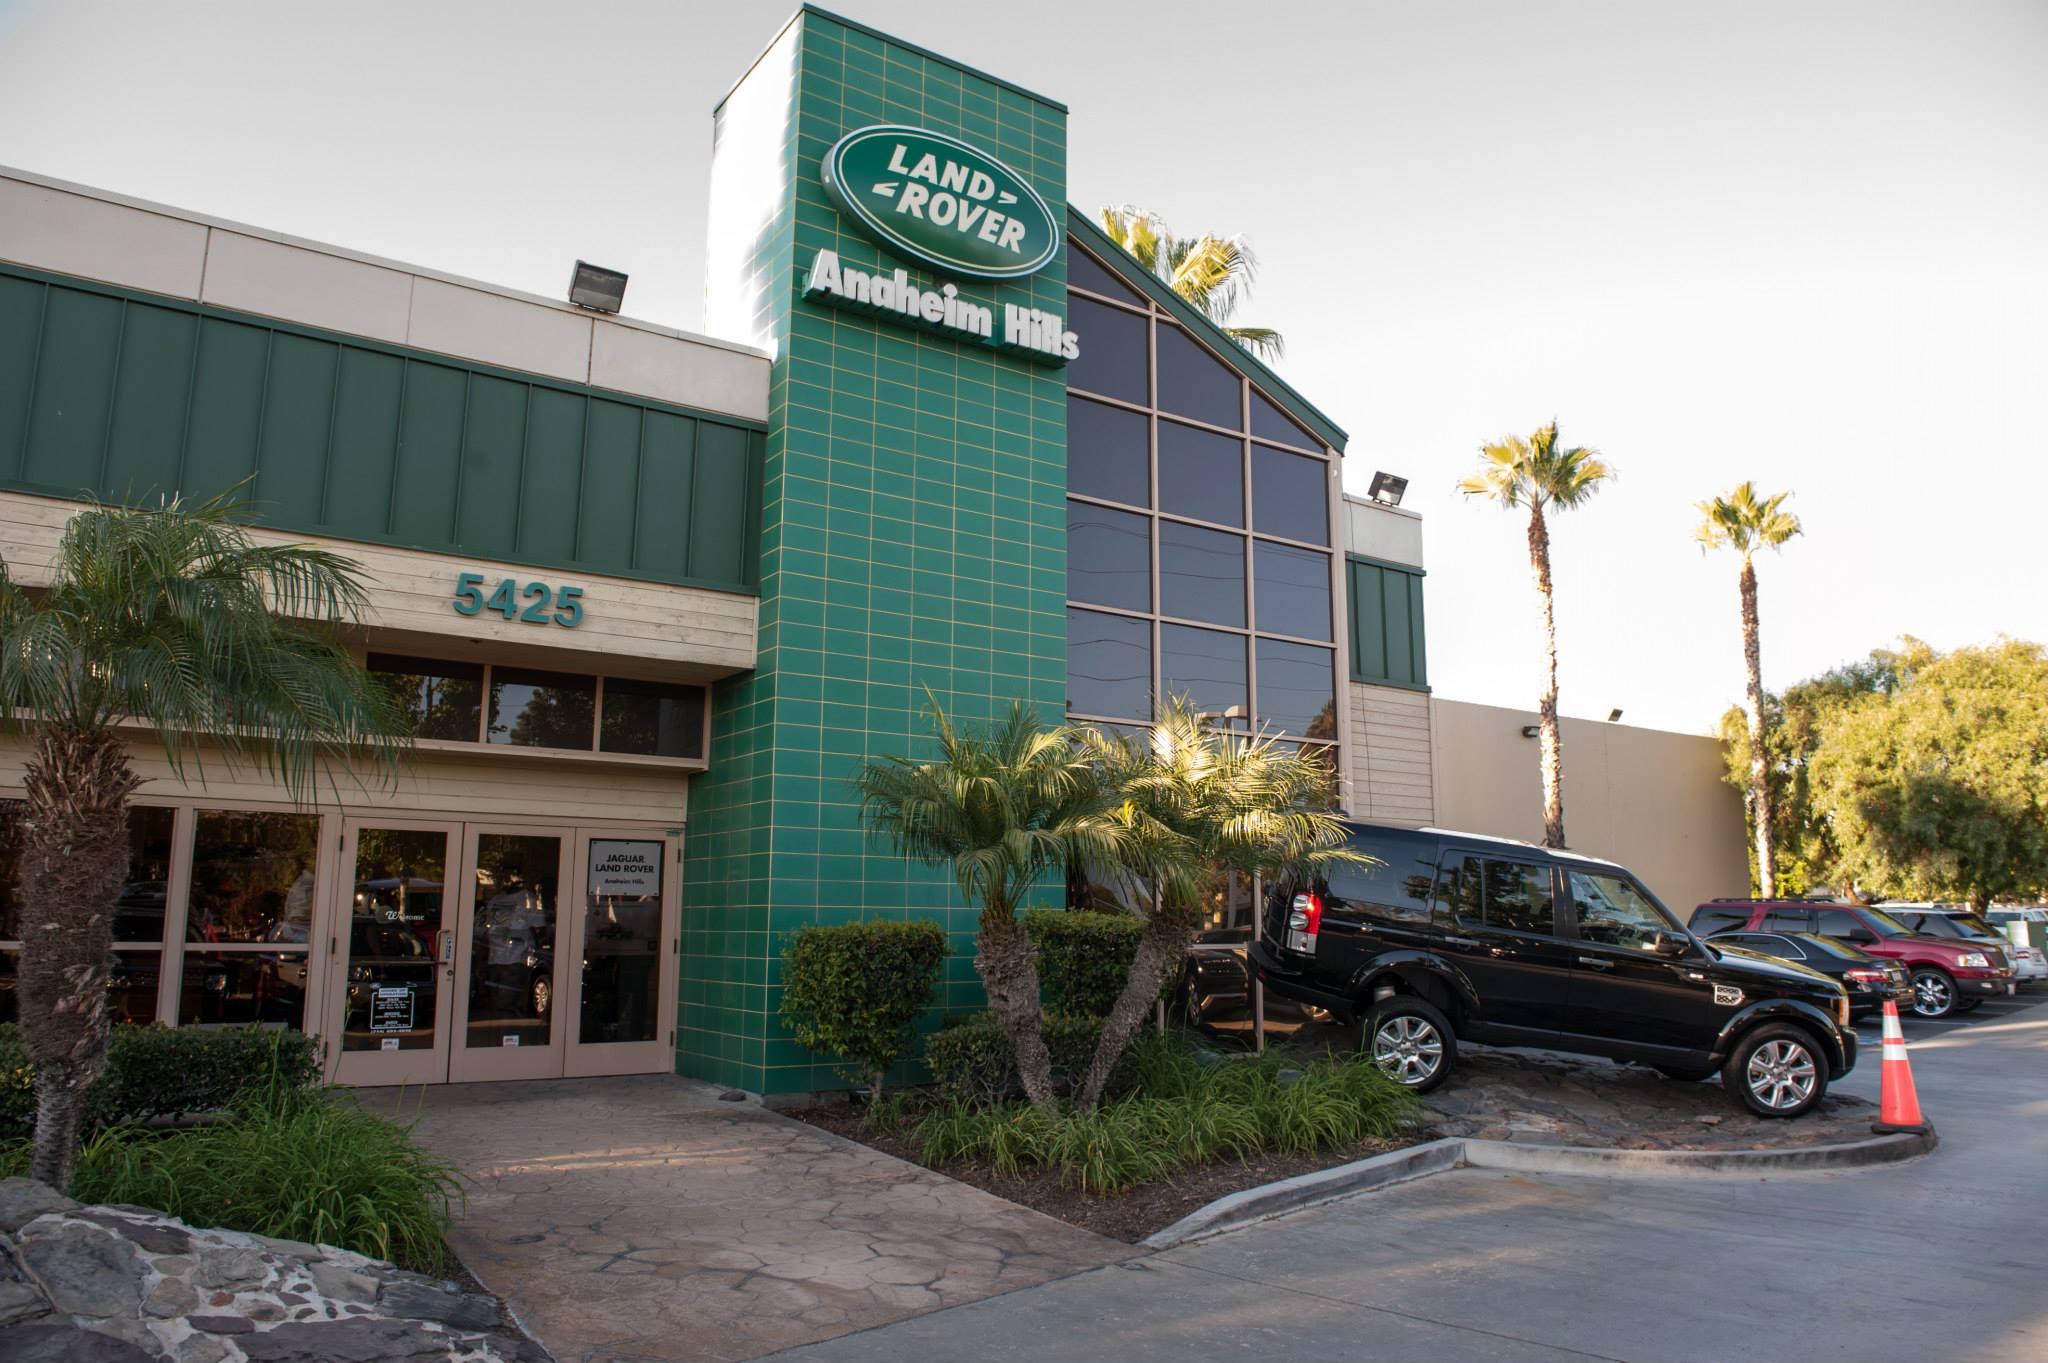 Land Rover Anaheim Hills >> 'CONSUMMATE PROFESSIONAL' | California Business Journal